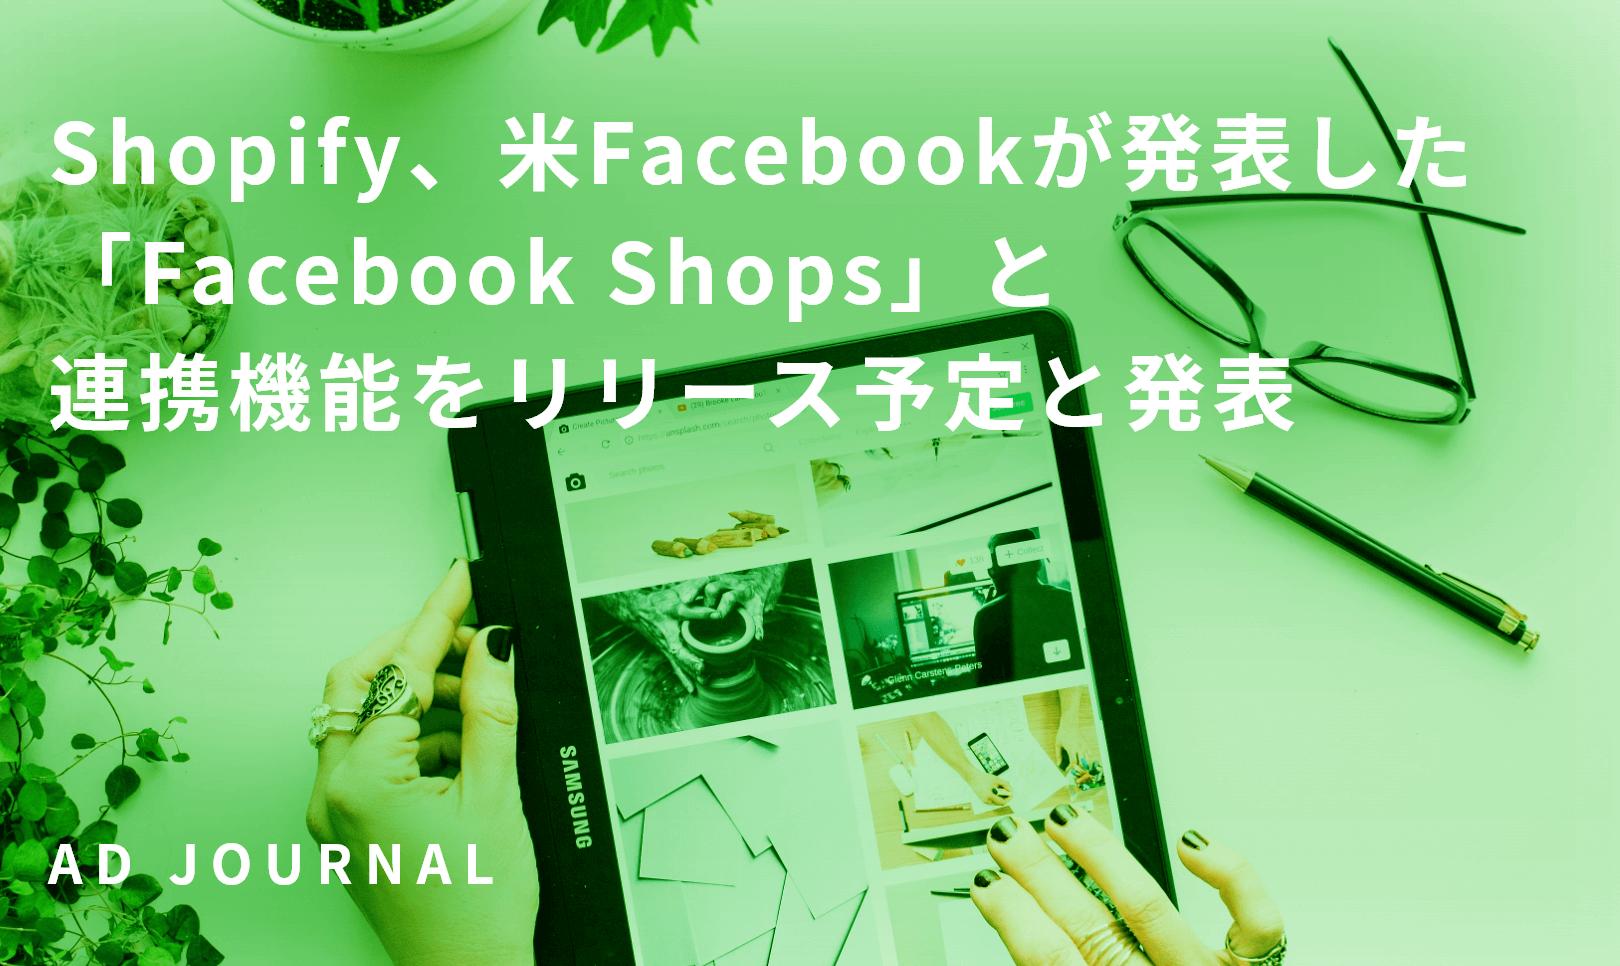 Shopify、米Facebookが発表した「Facebook Shops」と連携機能をリリース予定と発表